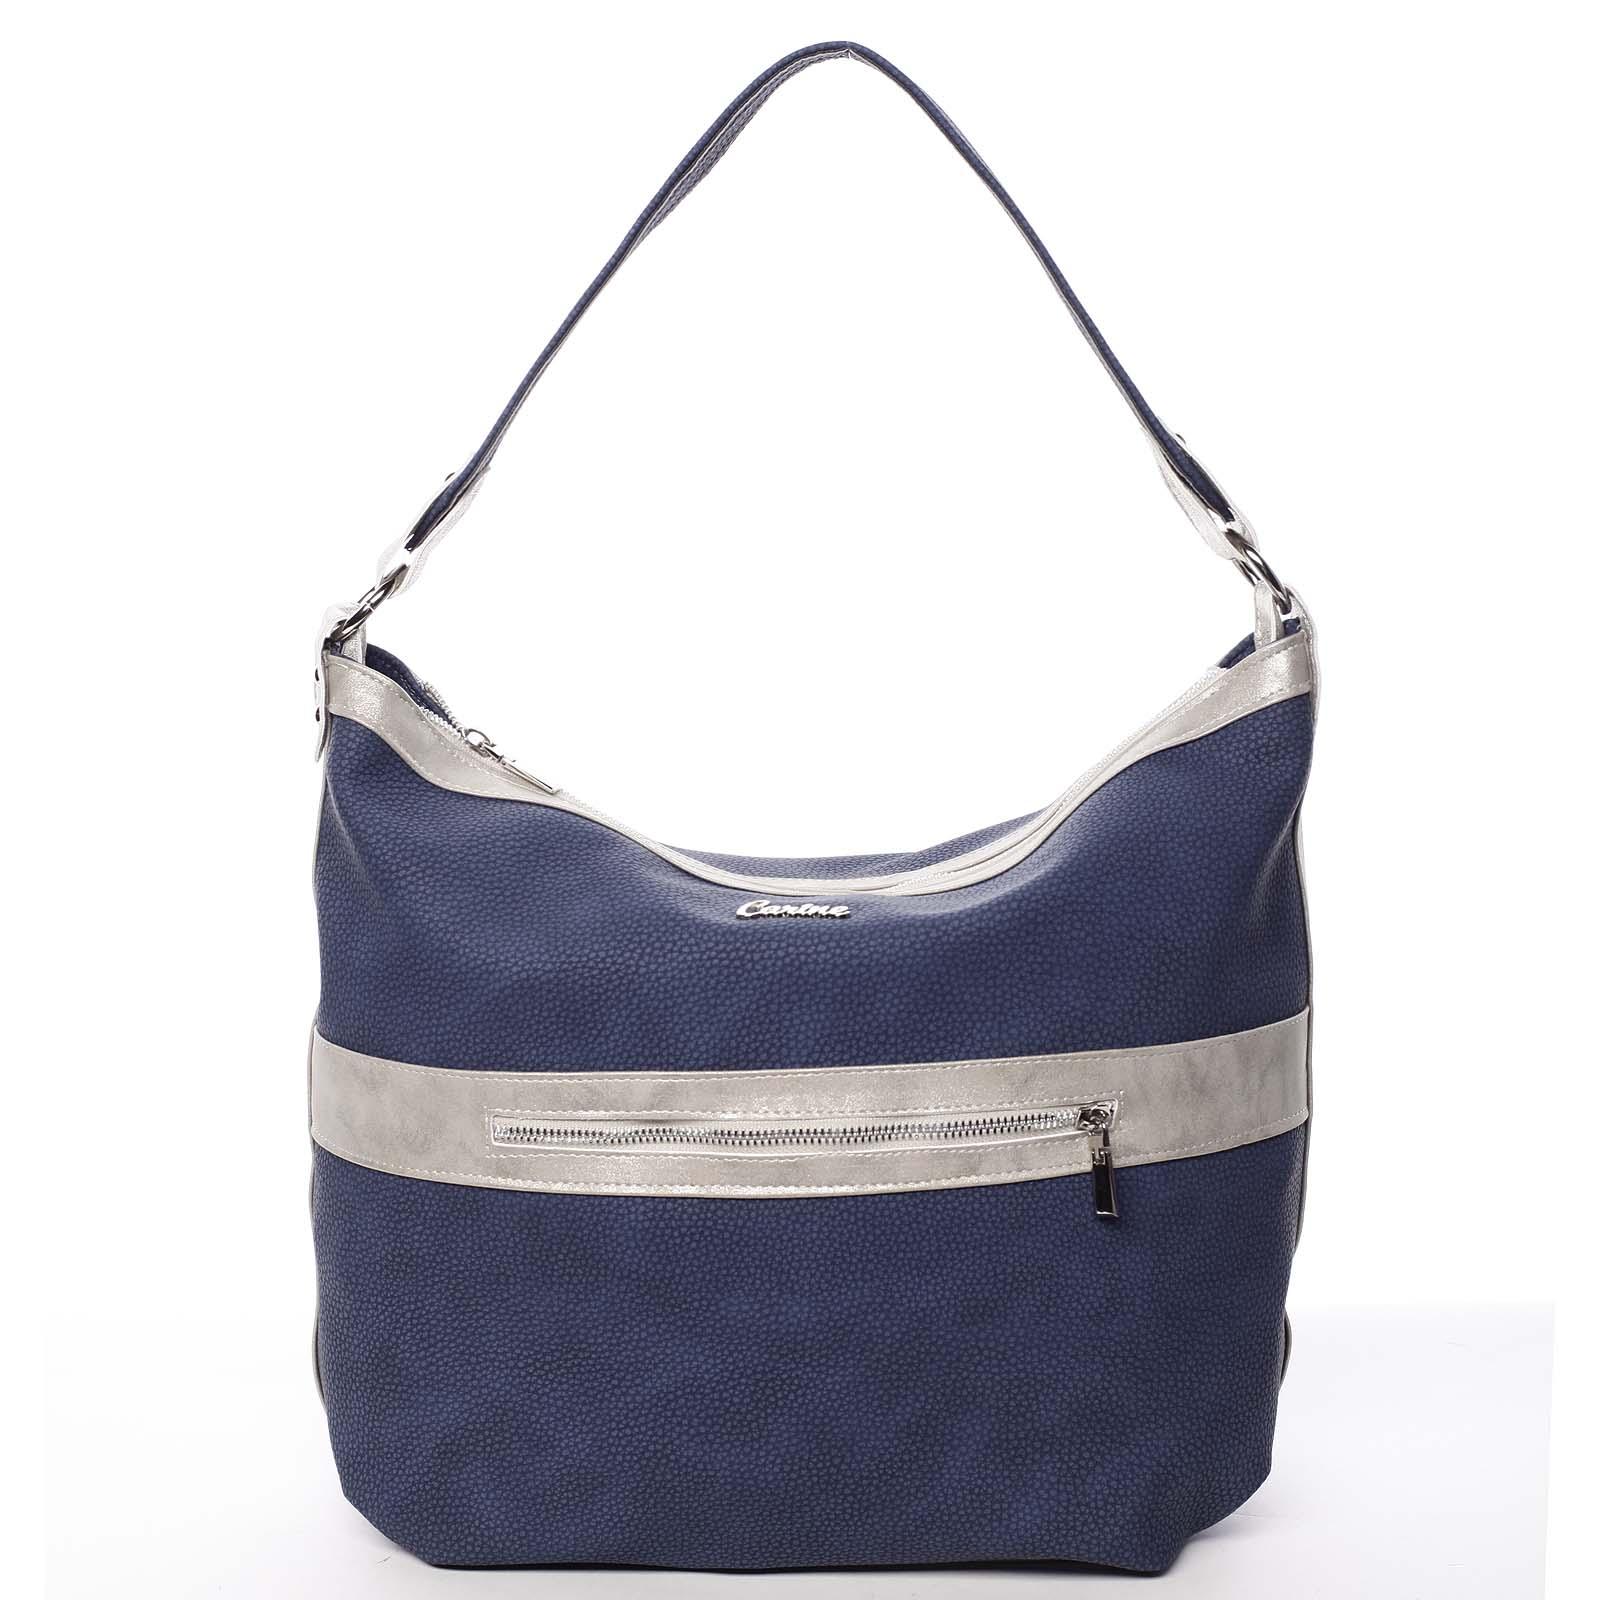 Trendy dámská kabelka tmavě modrá - Carine Taryn